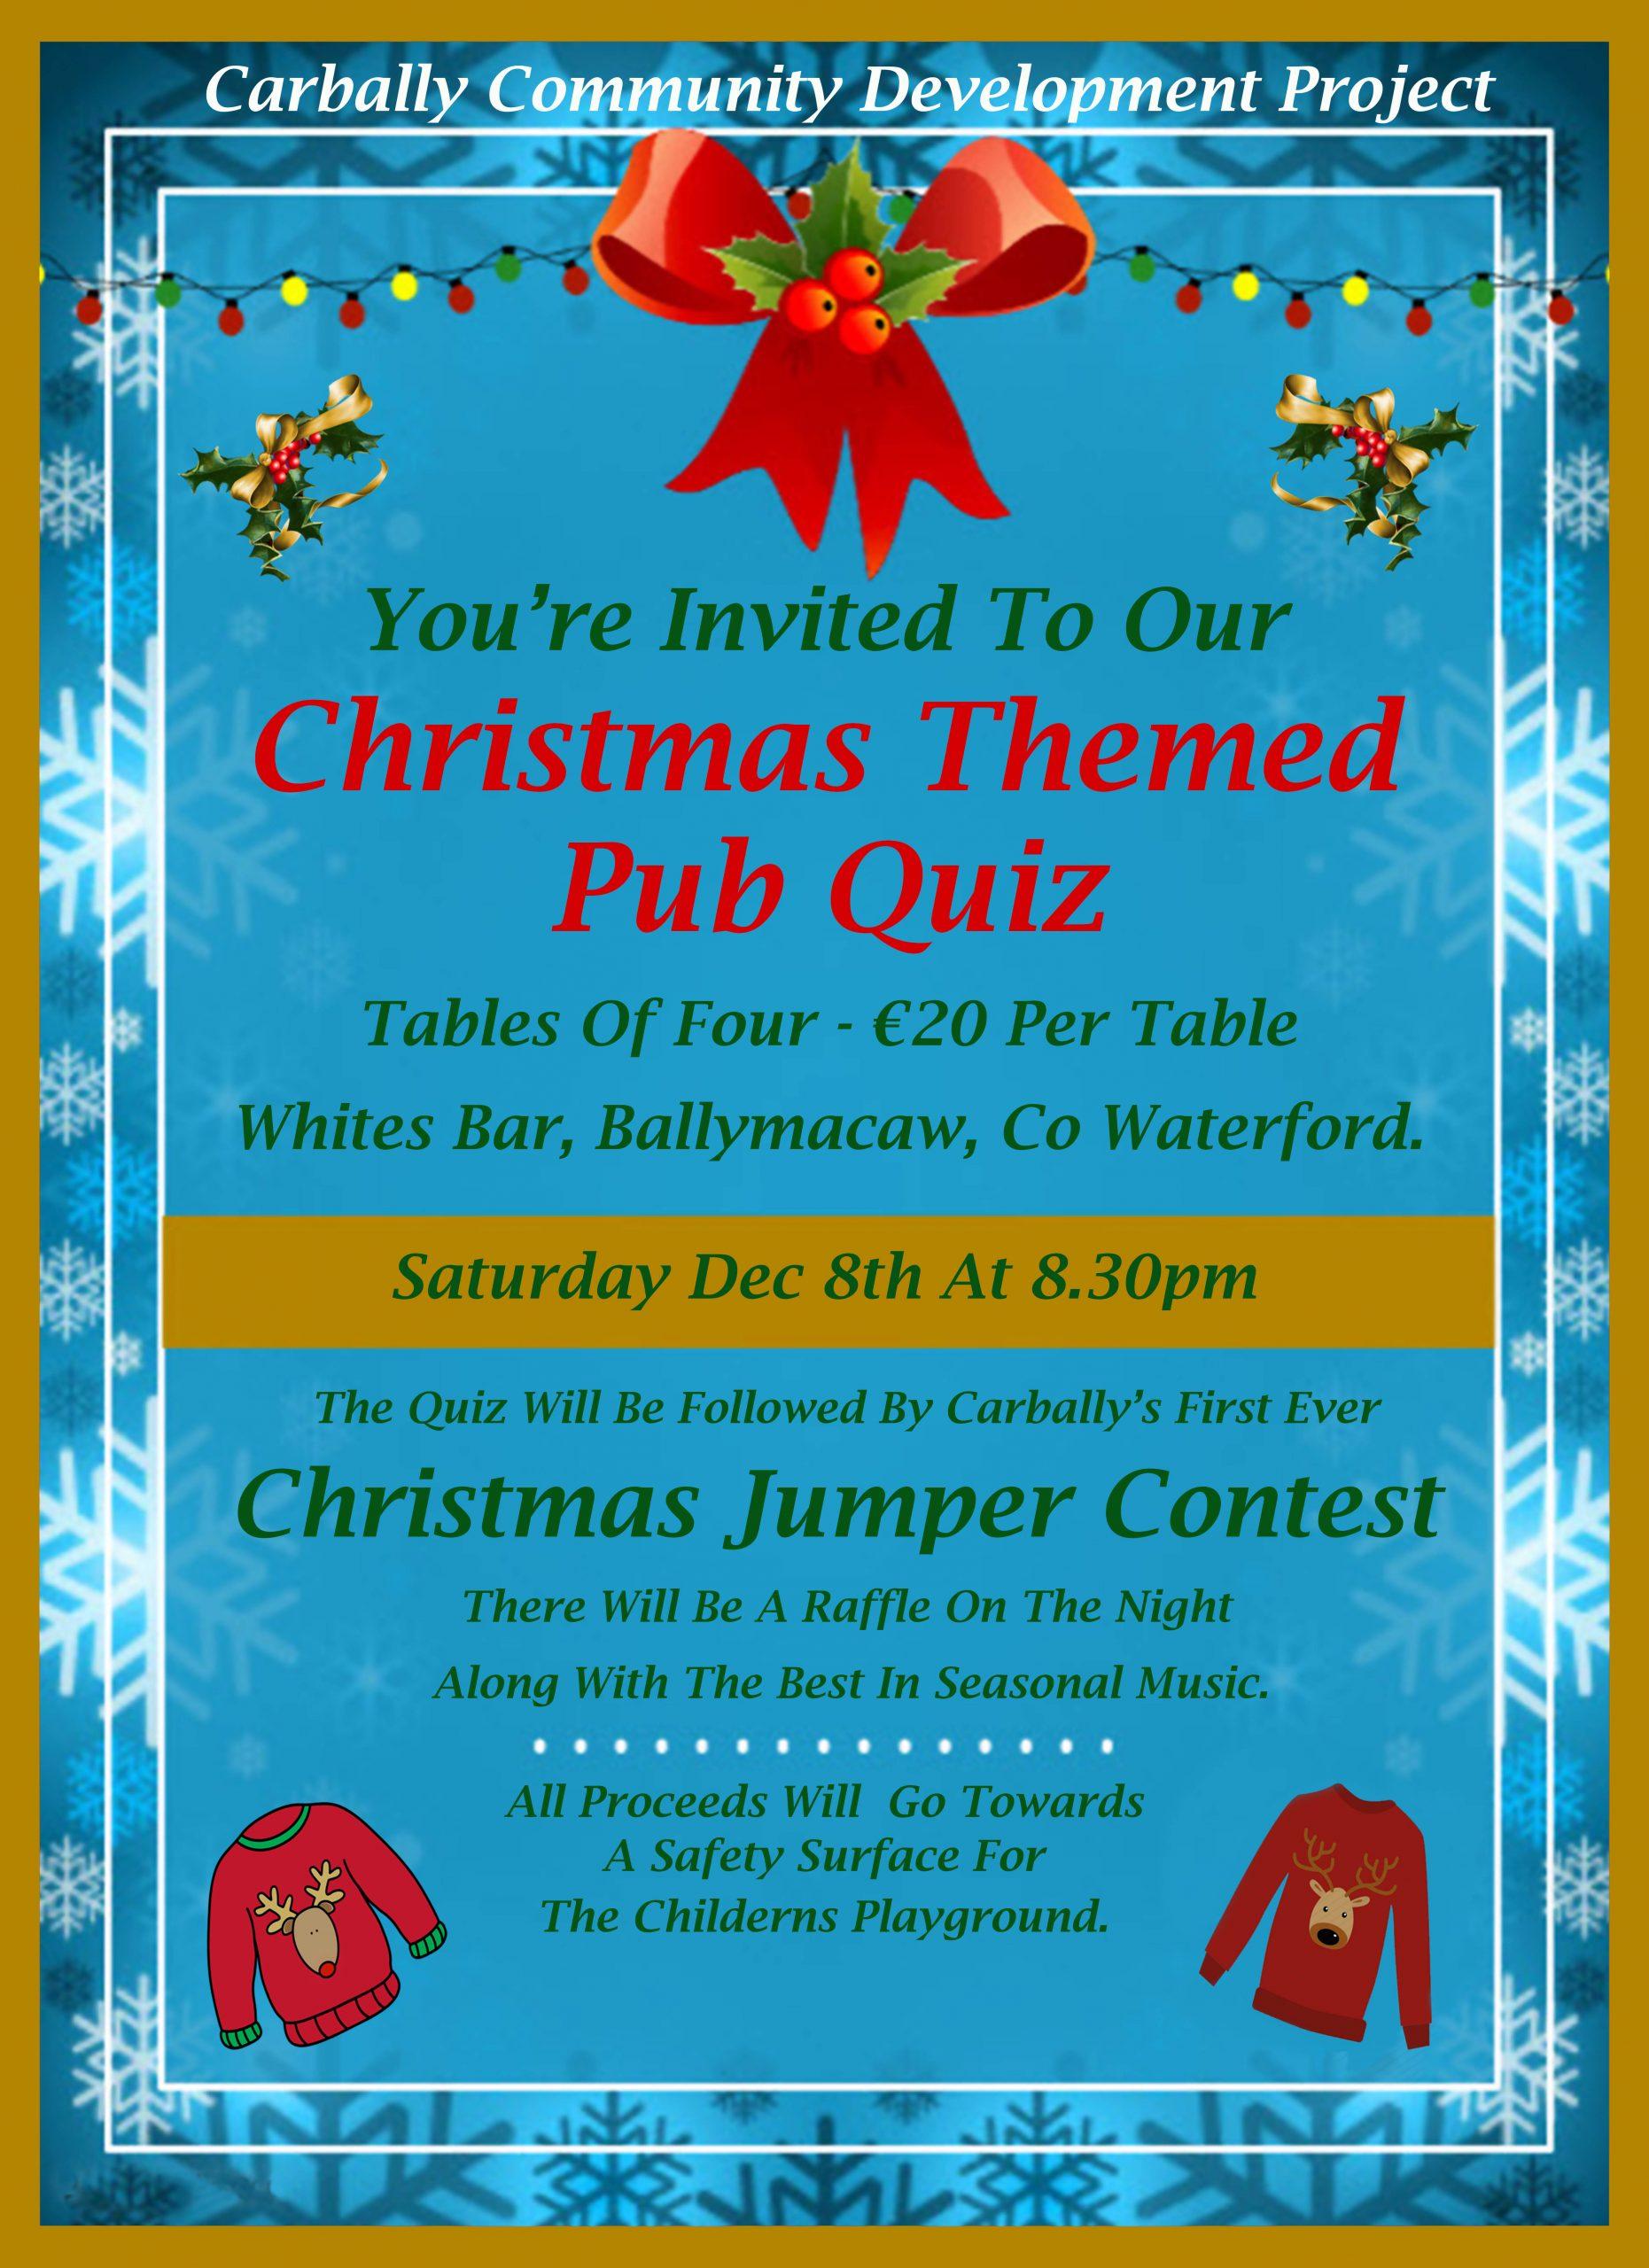 Carbally Community Development Project Pub Quiz- Saturday December 8th